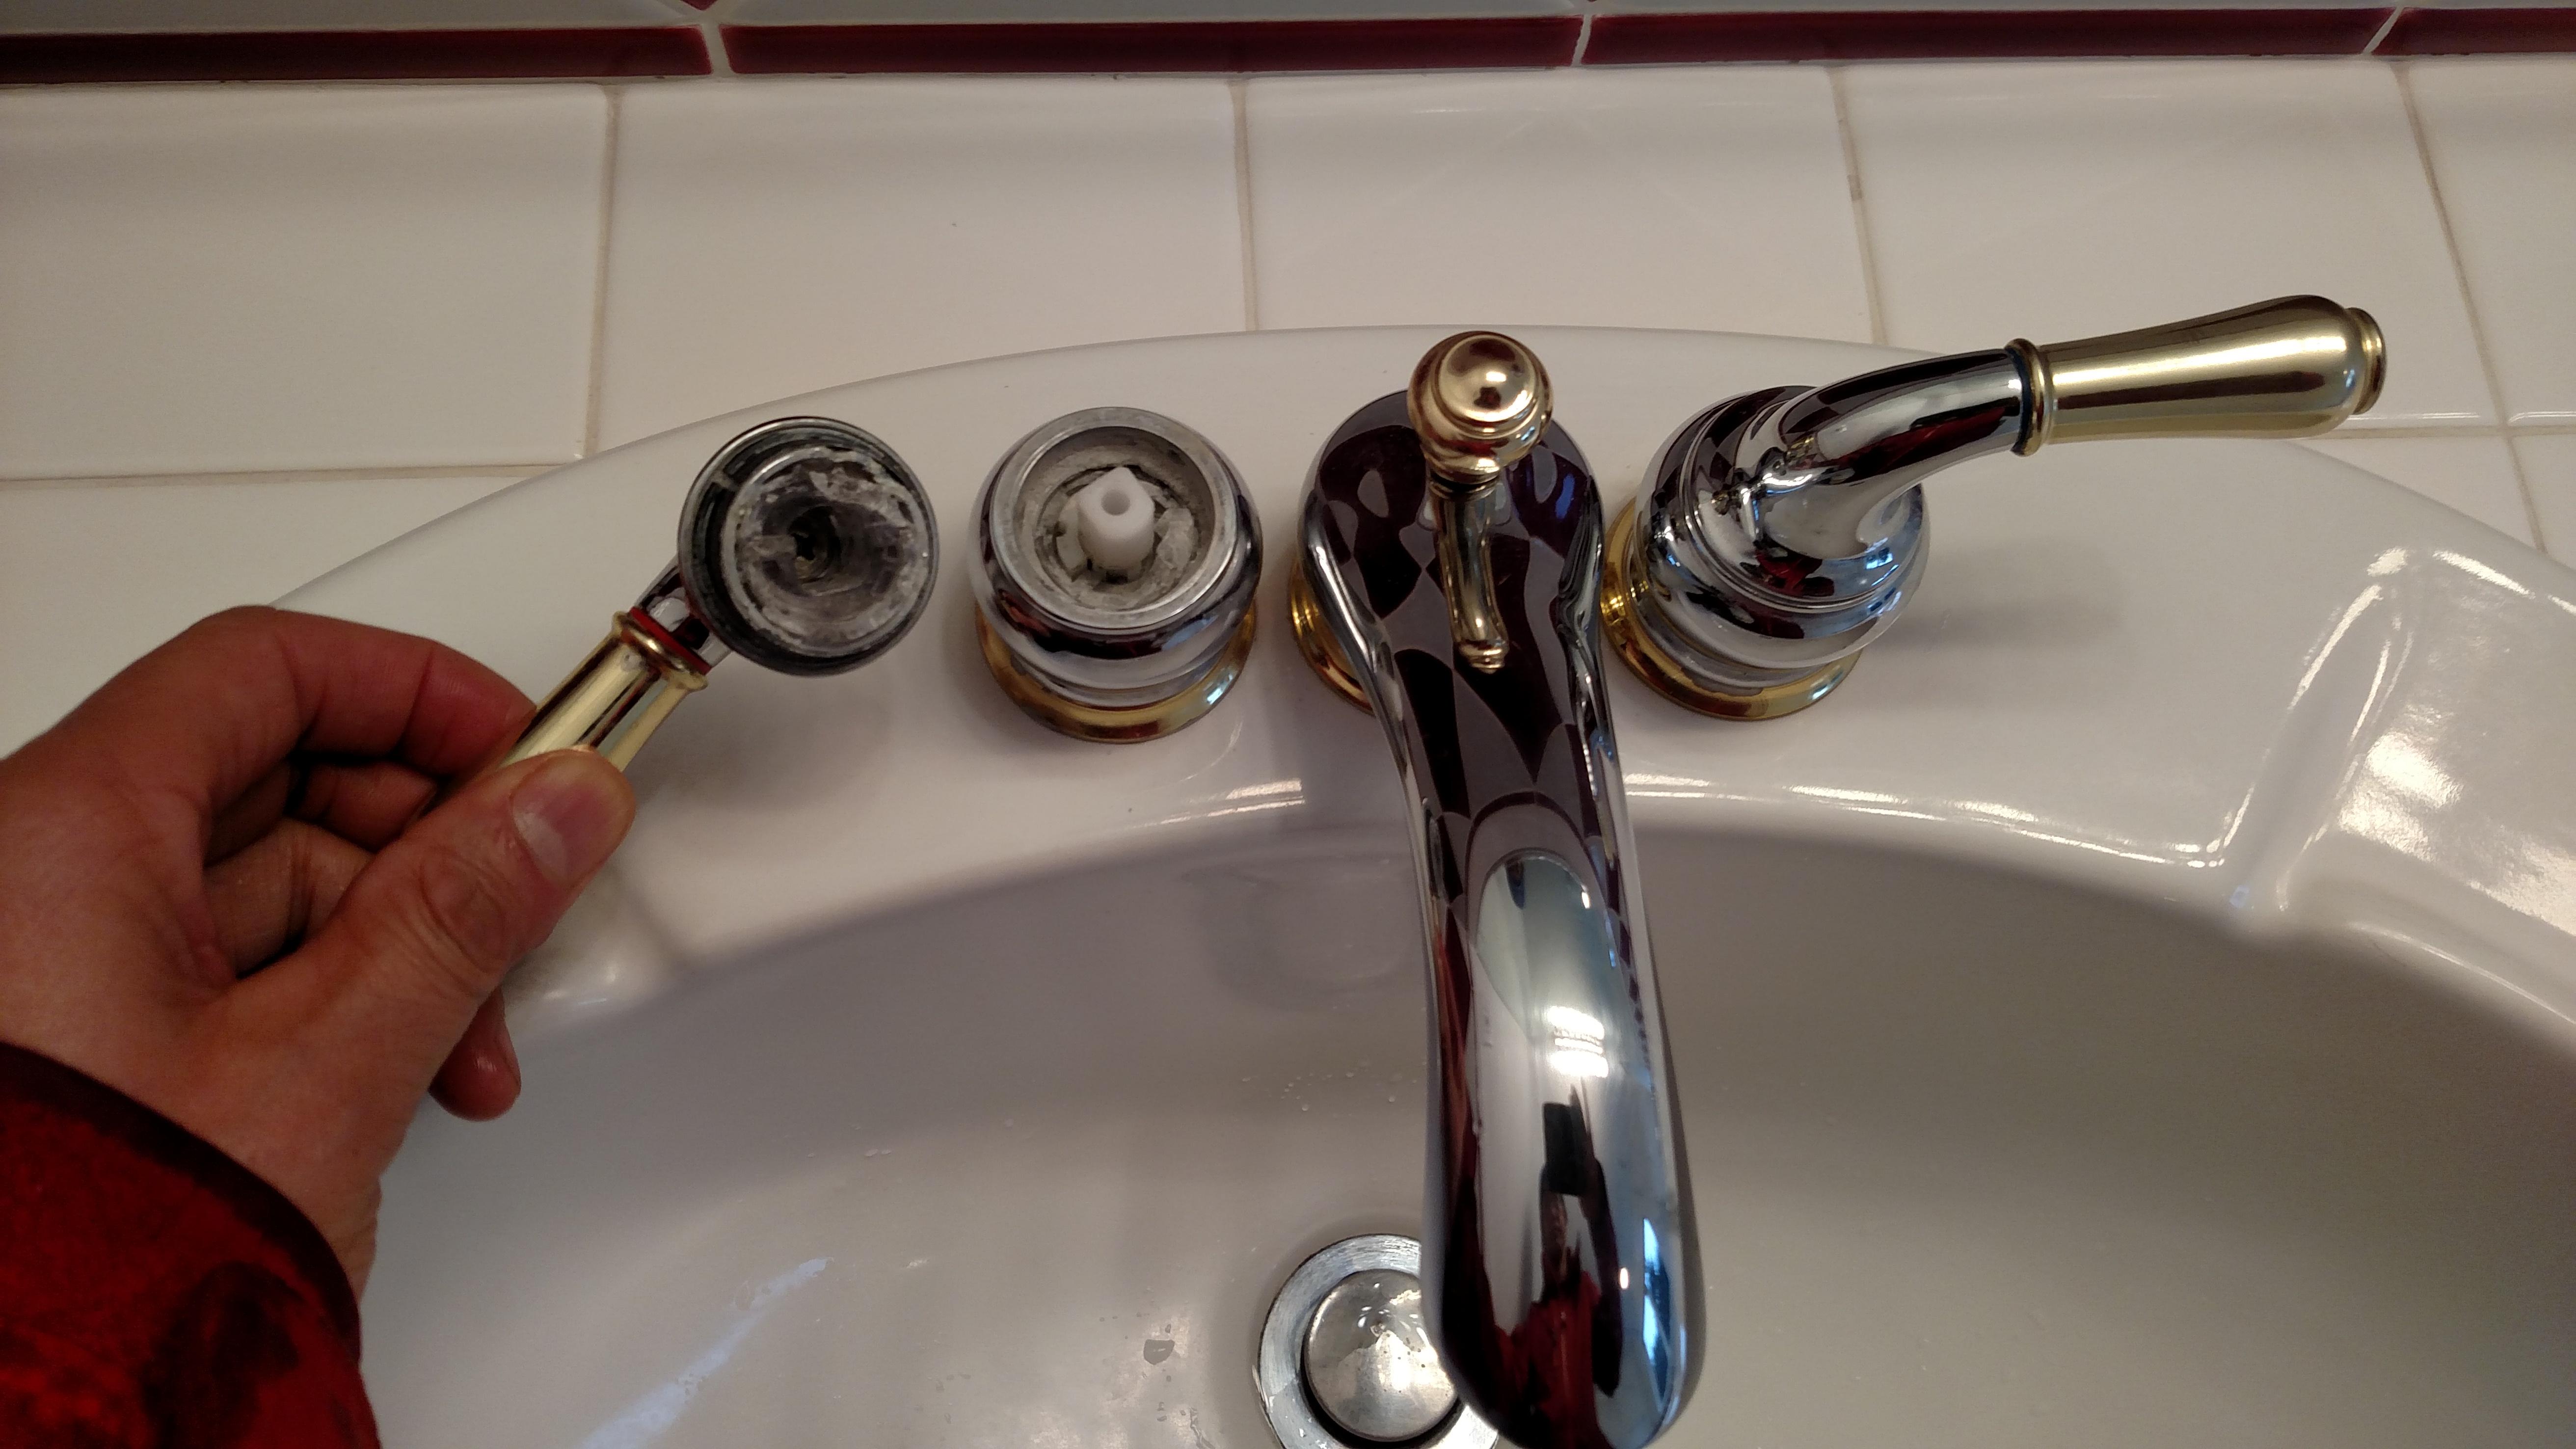 moen bathroom faucet handle loose image of bathroom and closet